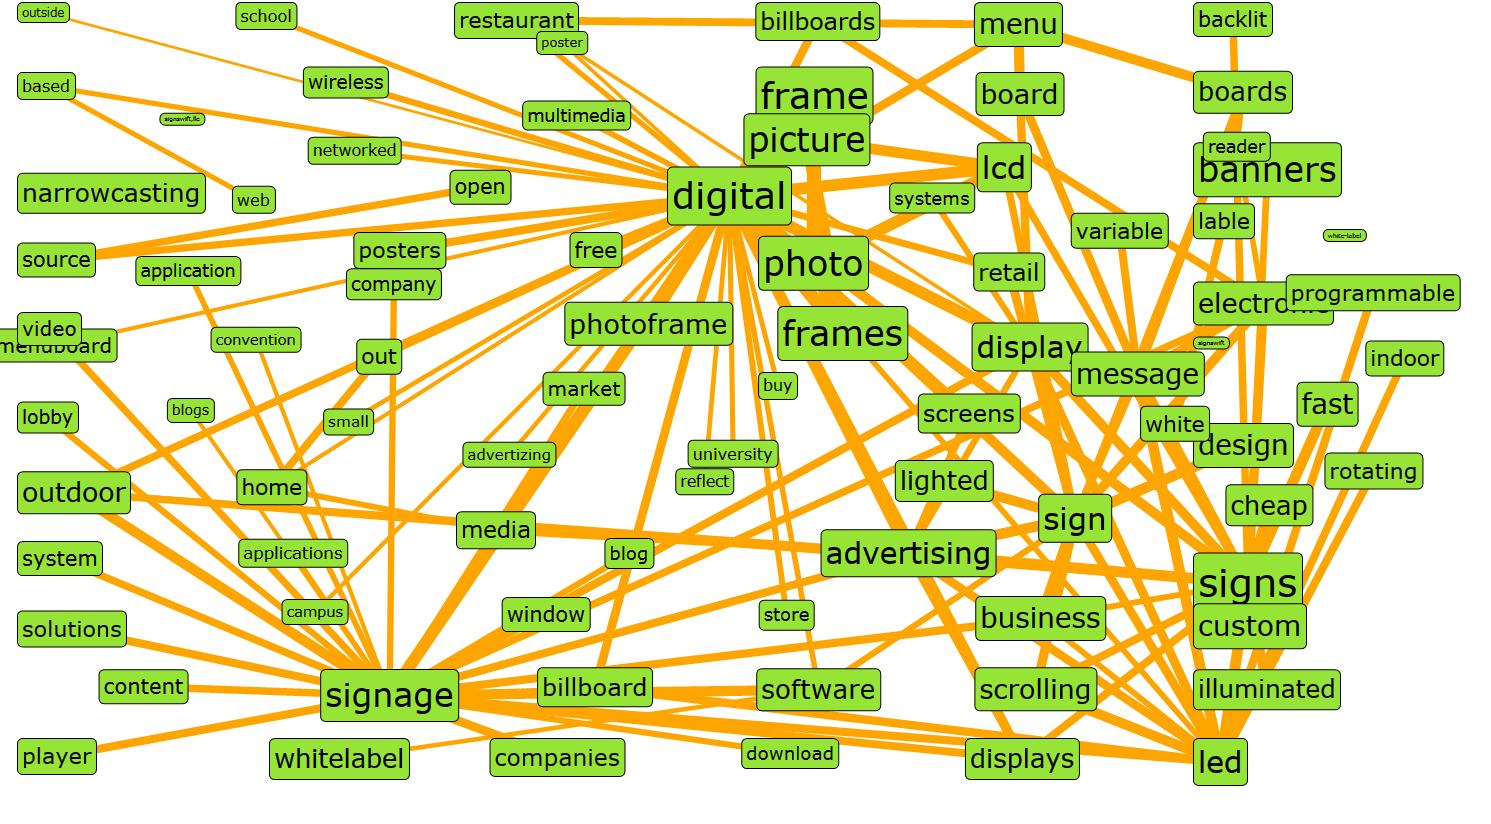 Seo keyword tool in action ian mercer seo keyword diagram ccuart Image collections